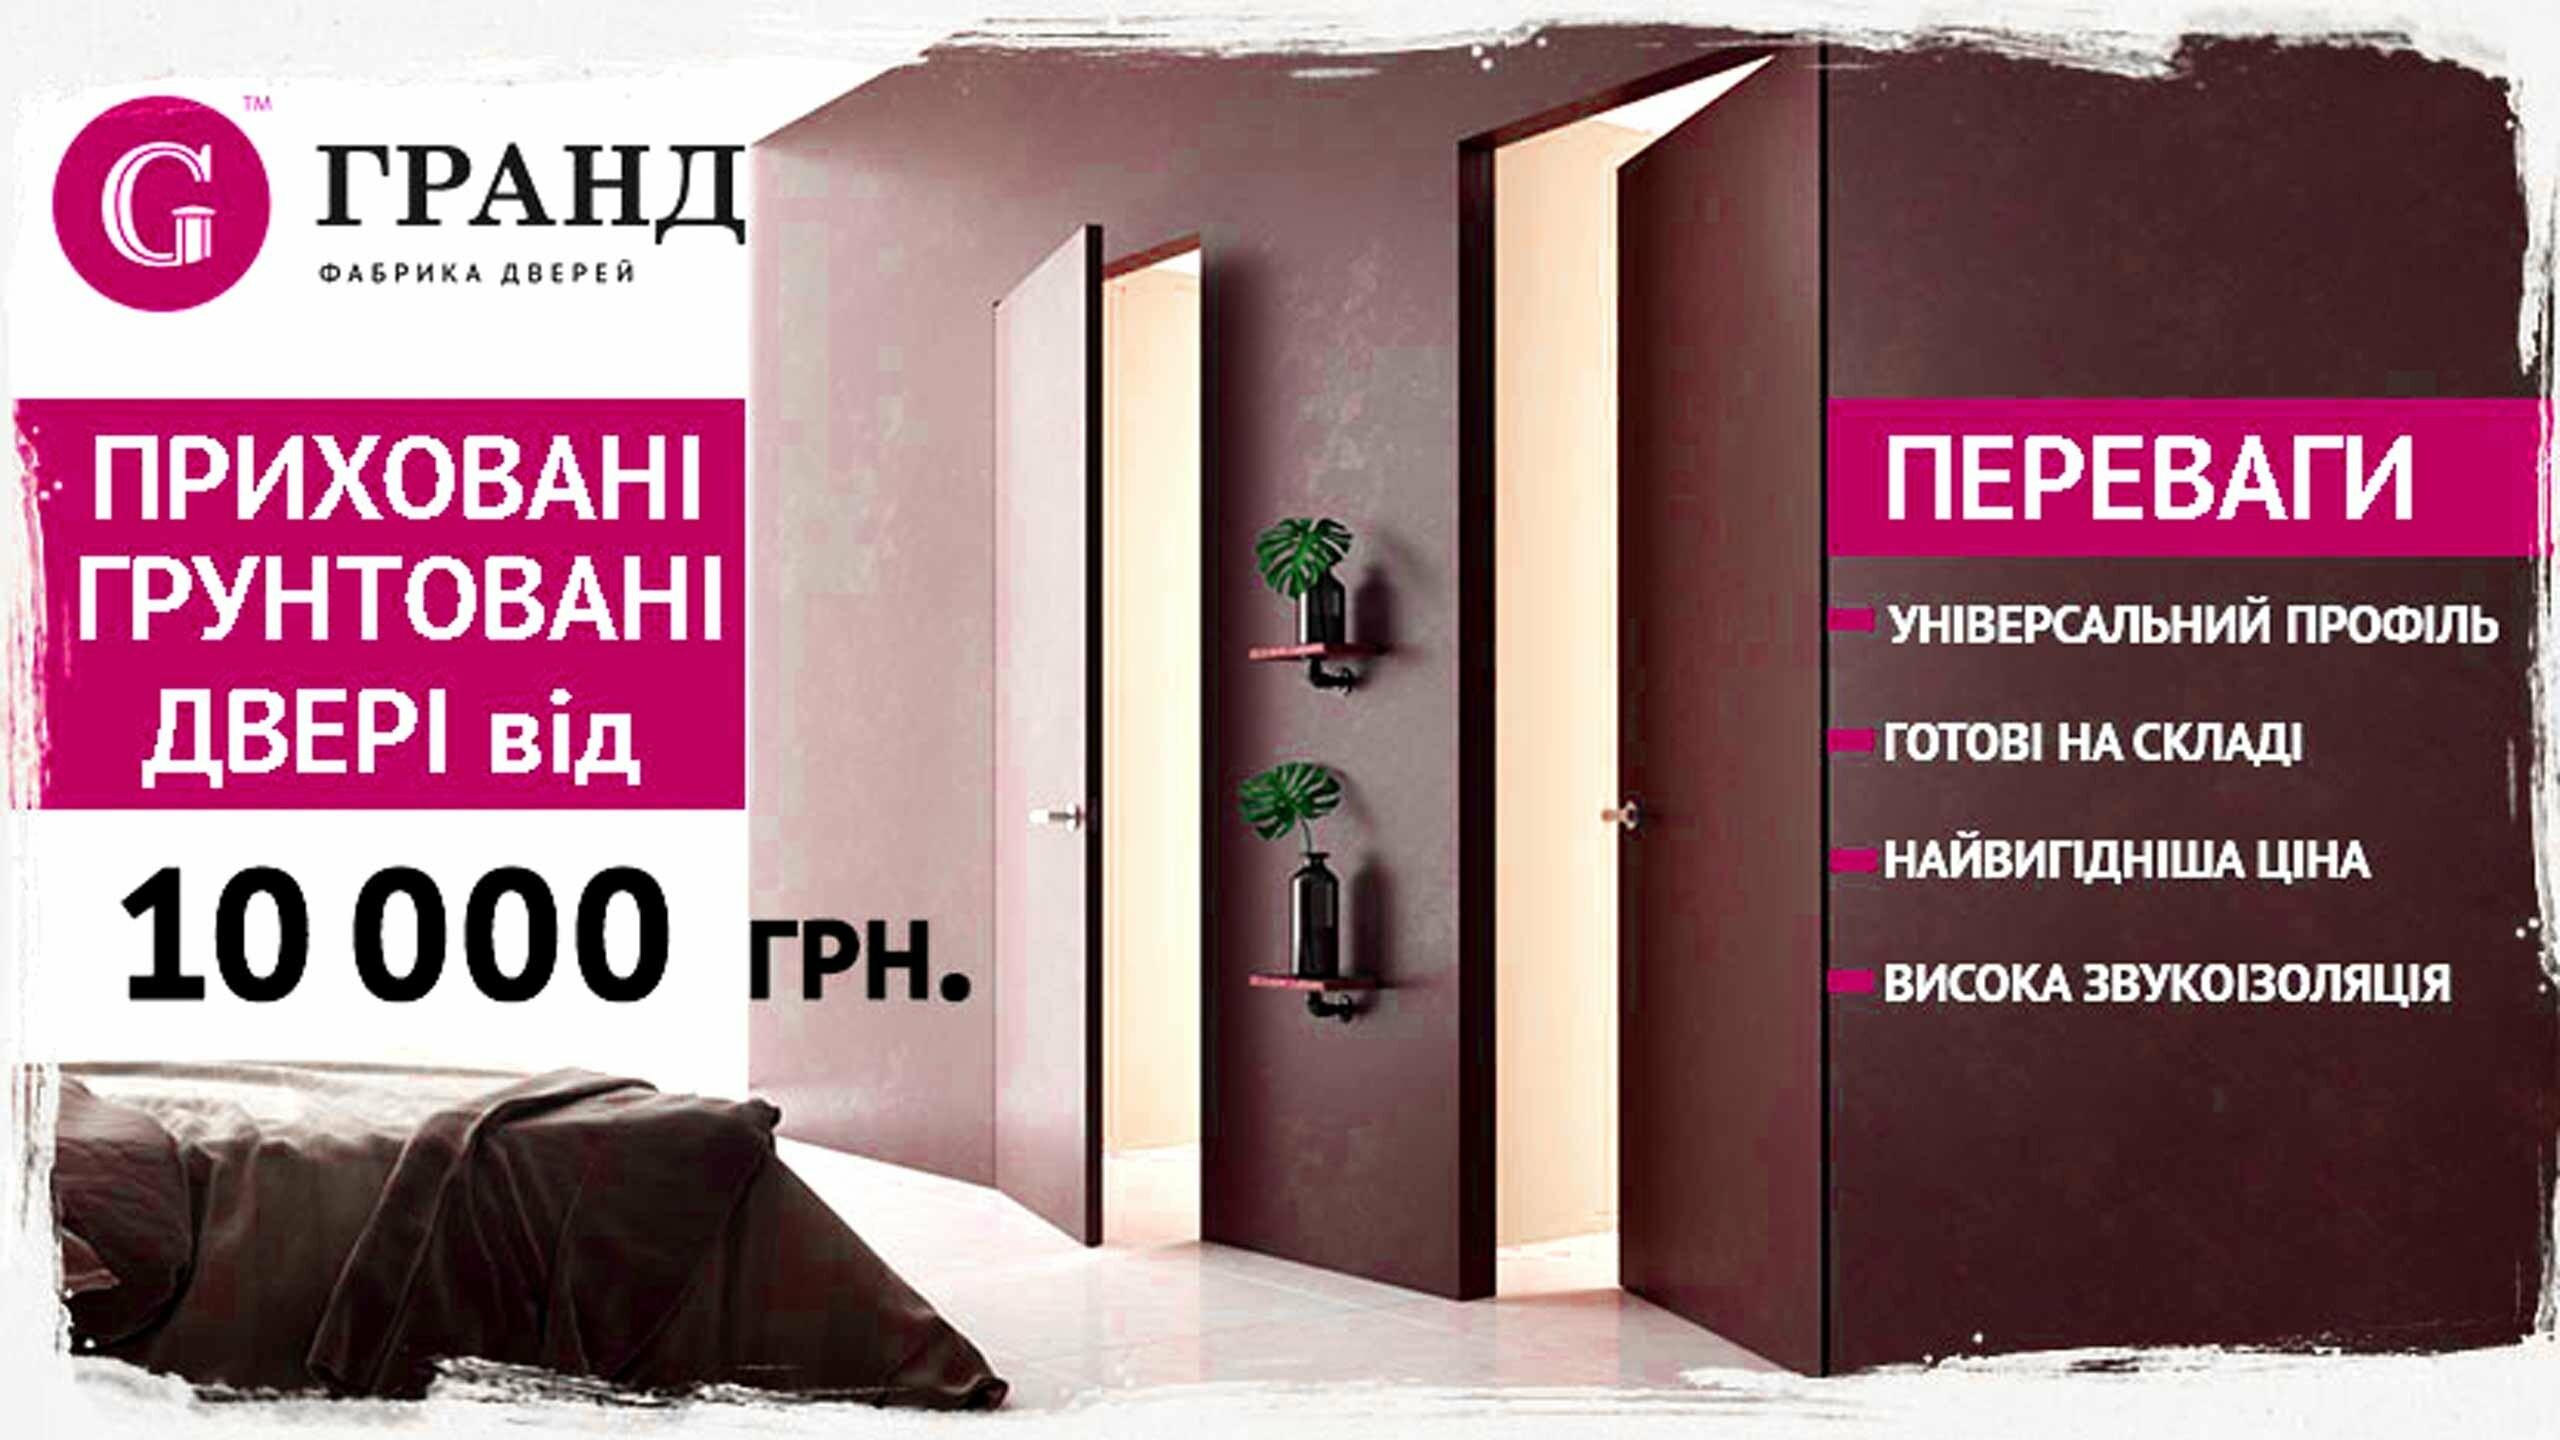 Реклама для магазина дверей